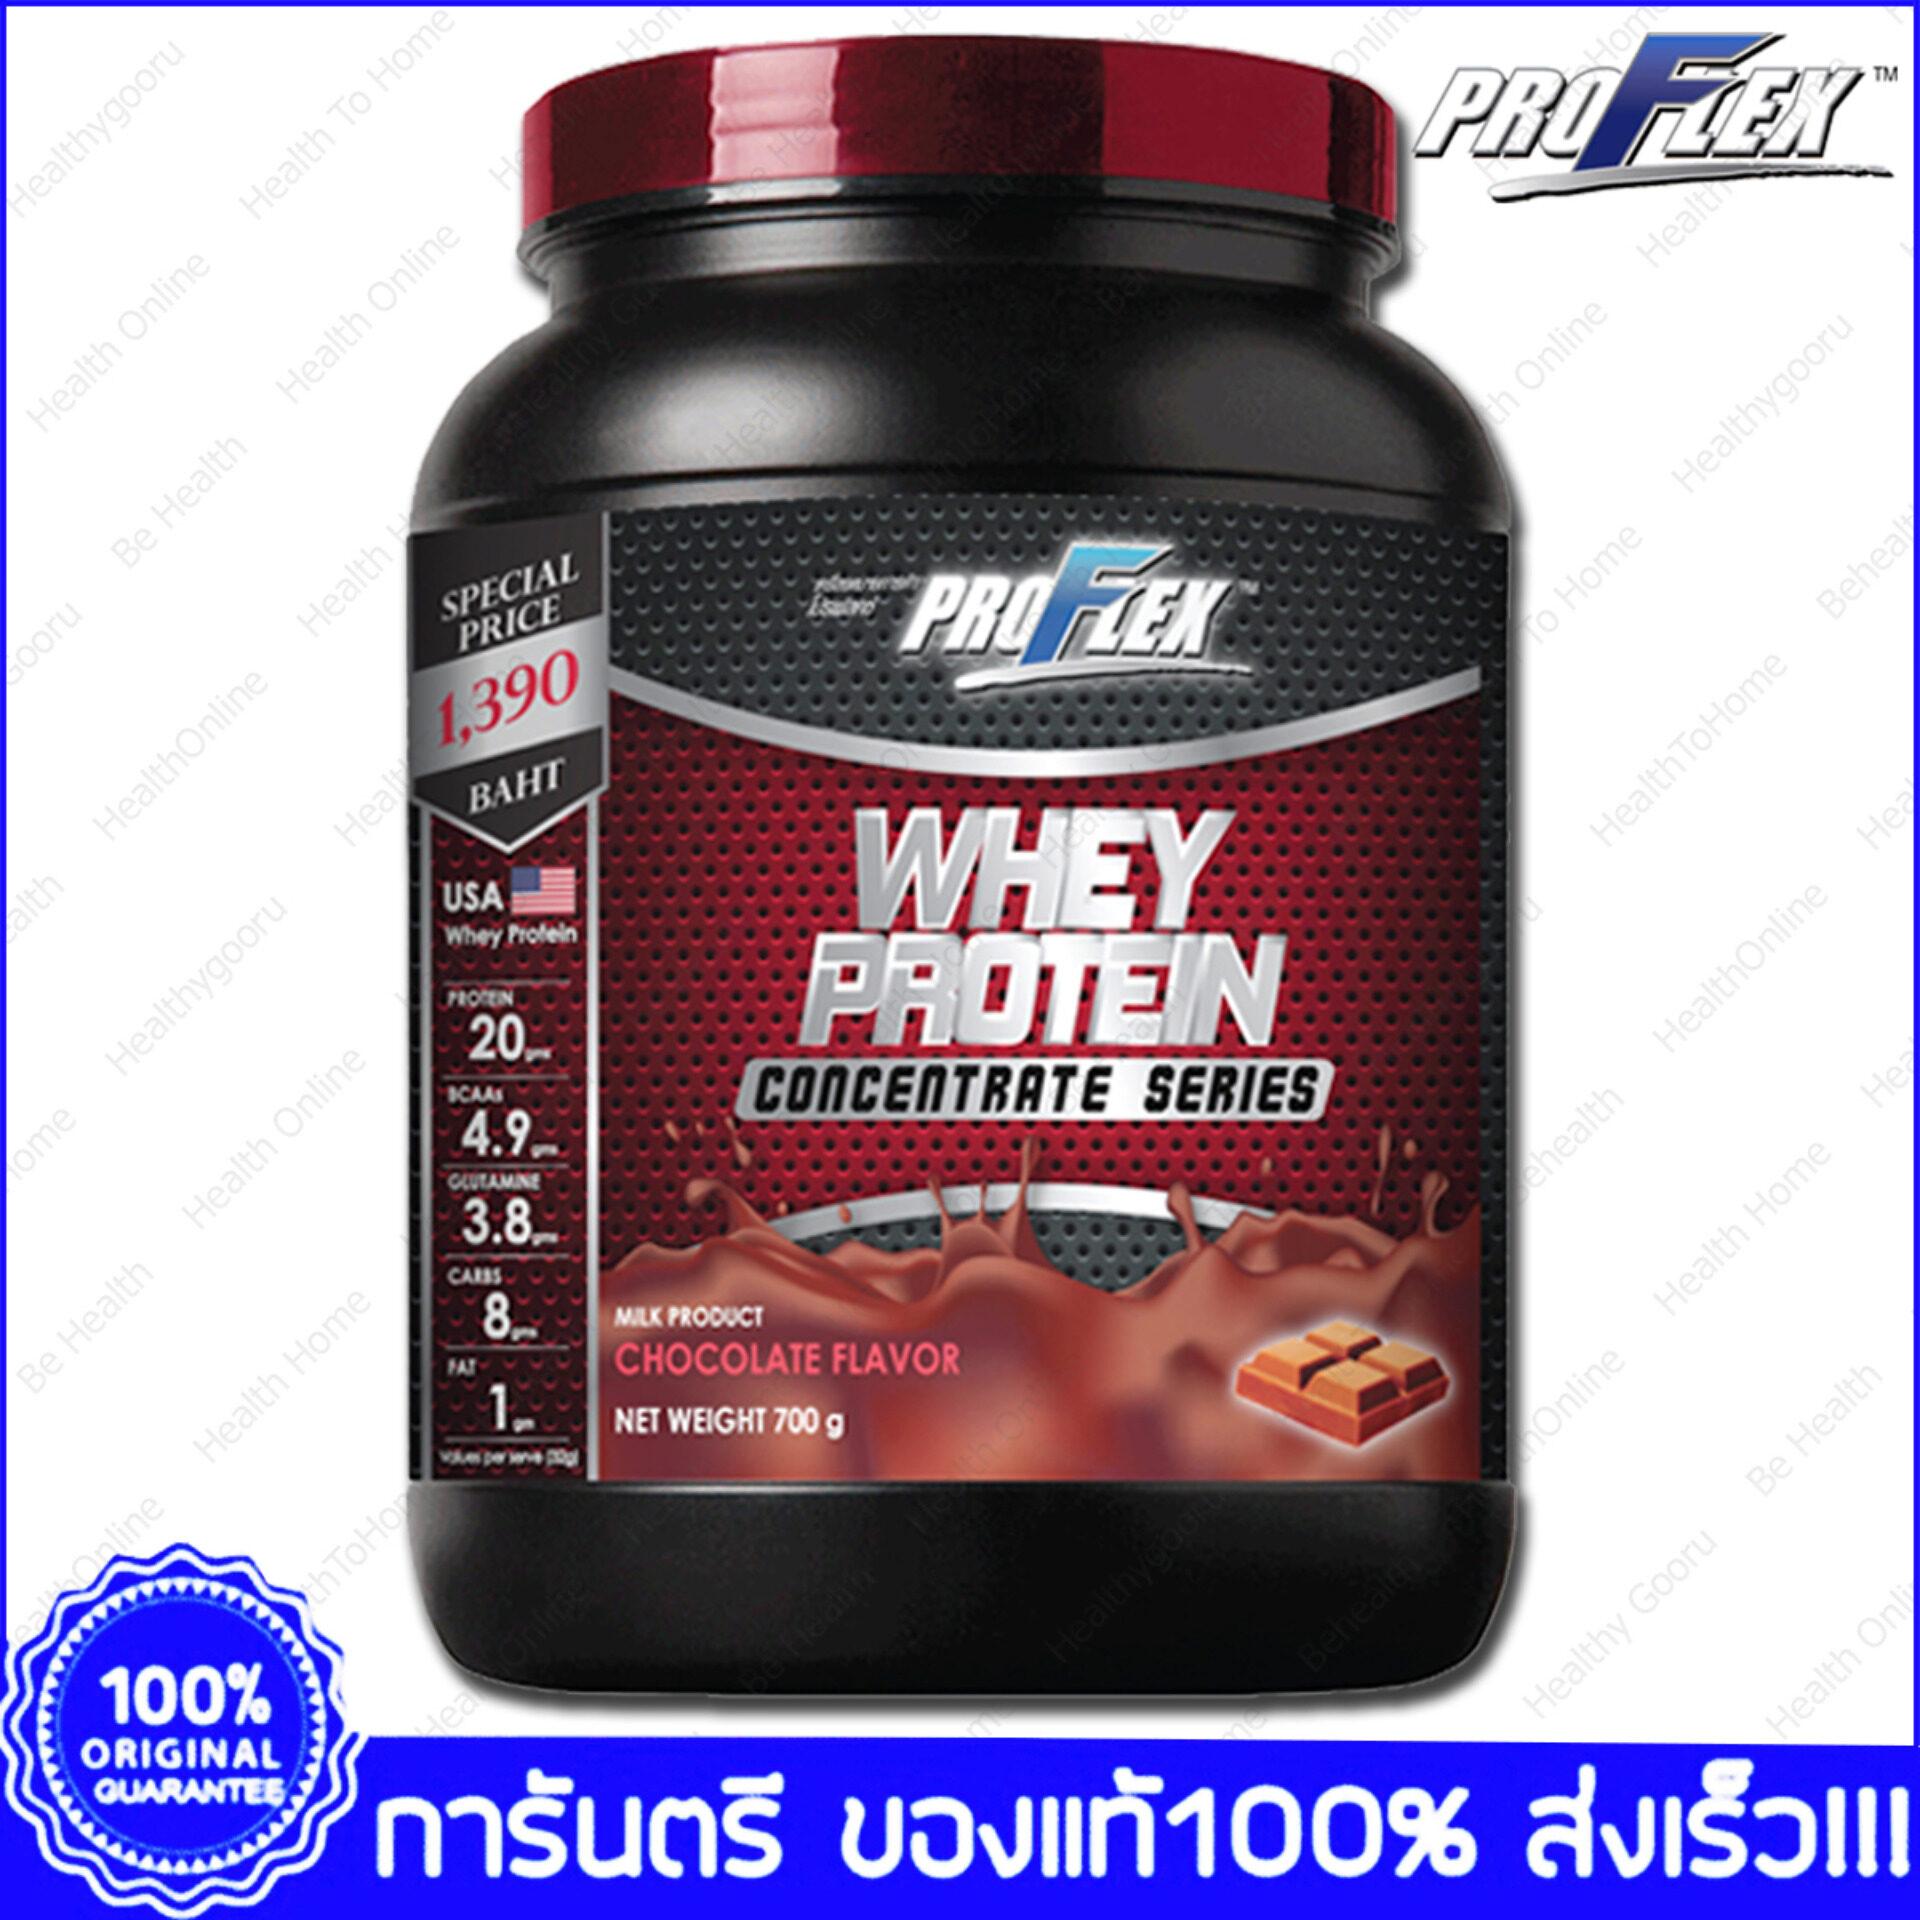 Proflex Whey Protein Concentrate Chocolate Flavor โปรเฟล็กซ์ เวย์โปรตีน กลิ่นช็อคโกแลต 700 g. x 1 Bottle